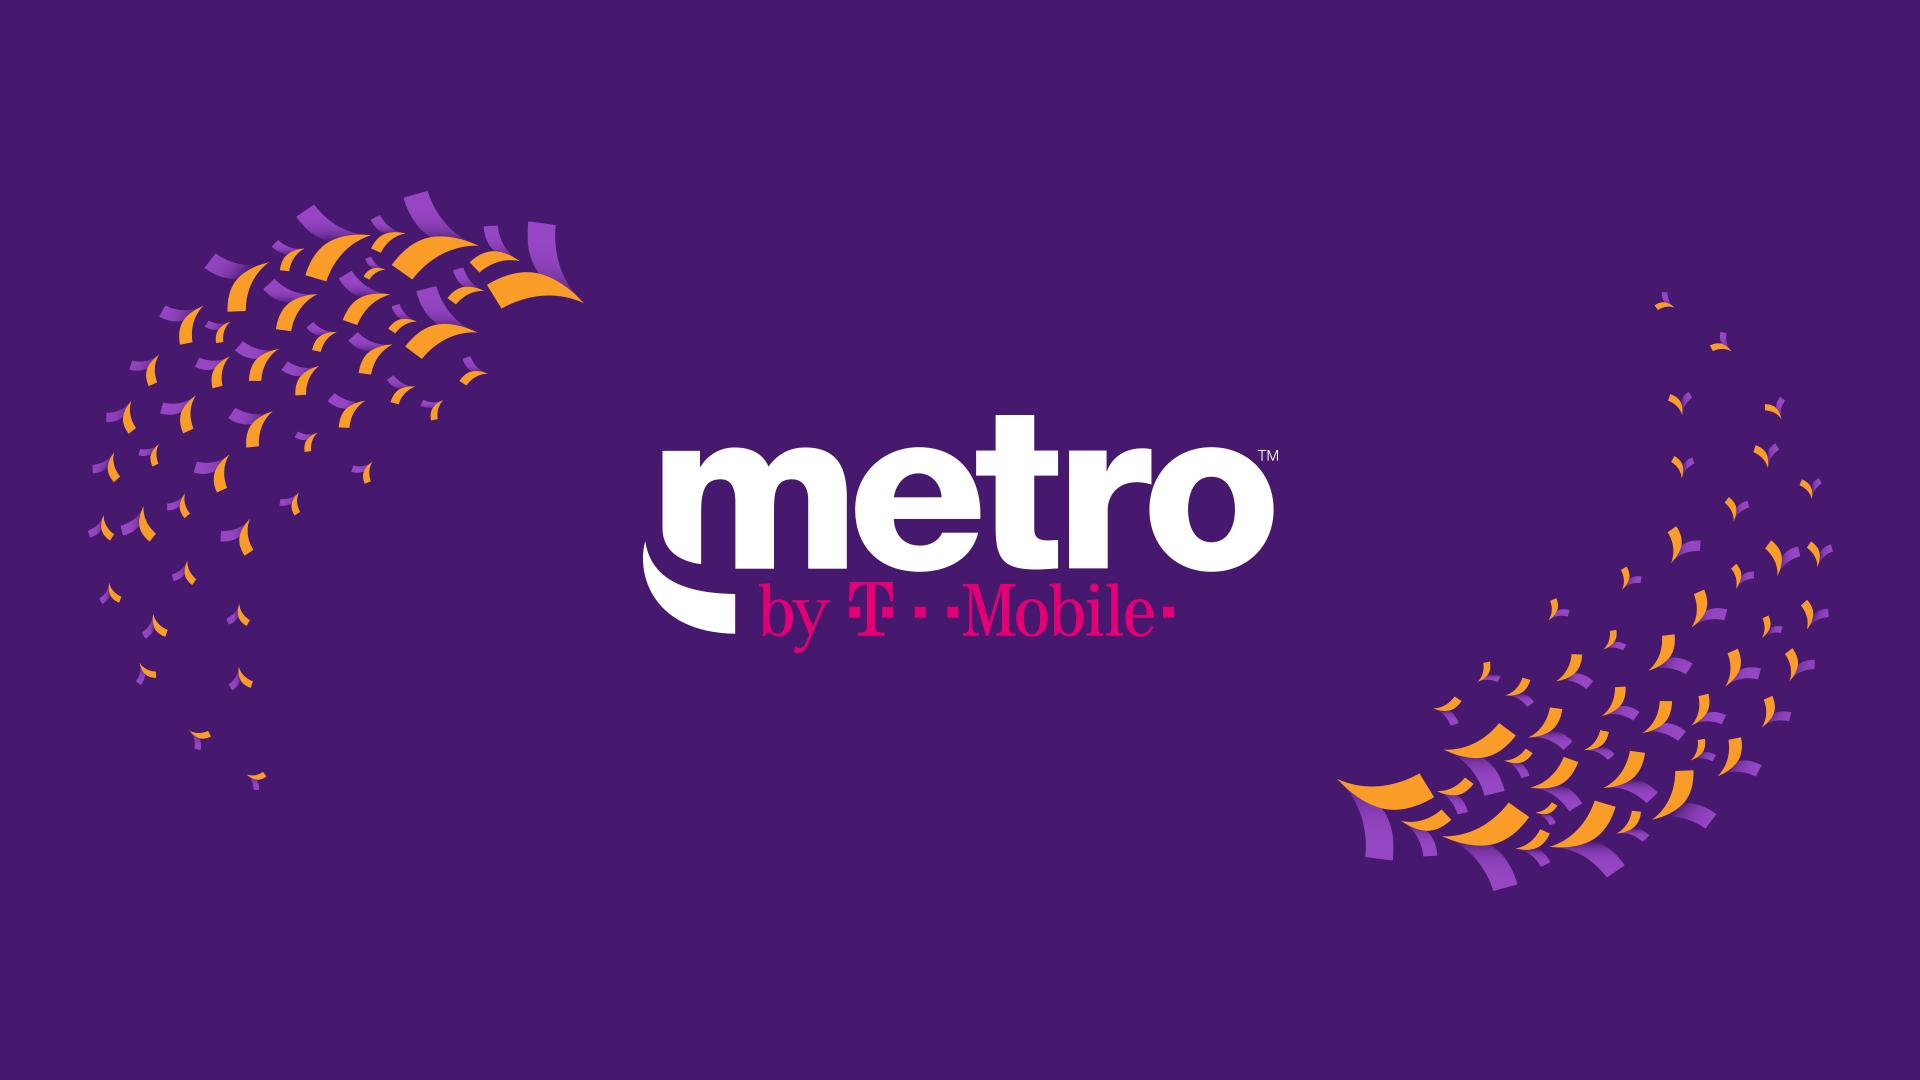 MetroPCS Macon